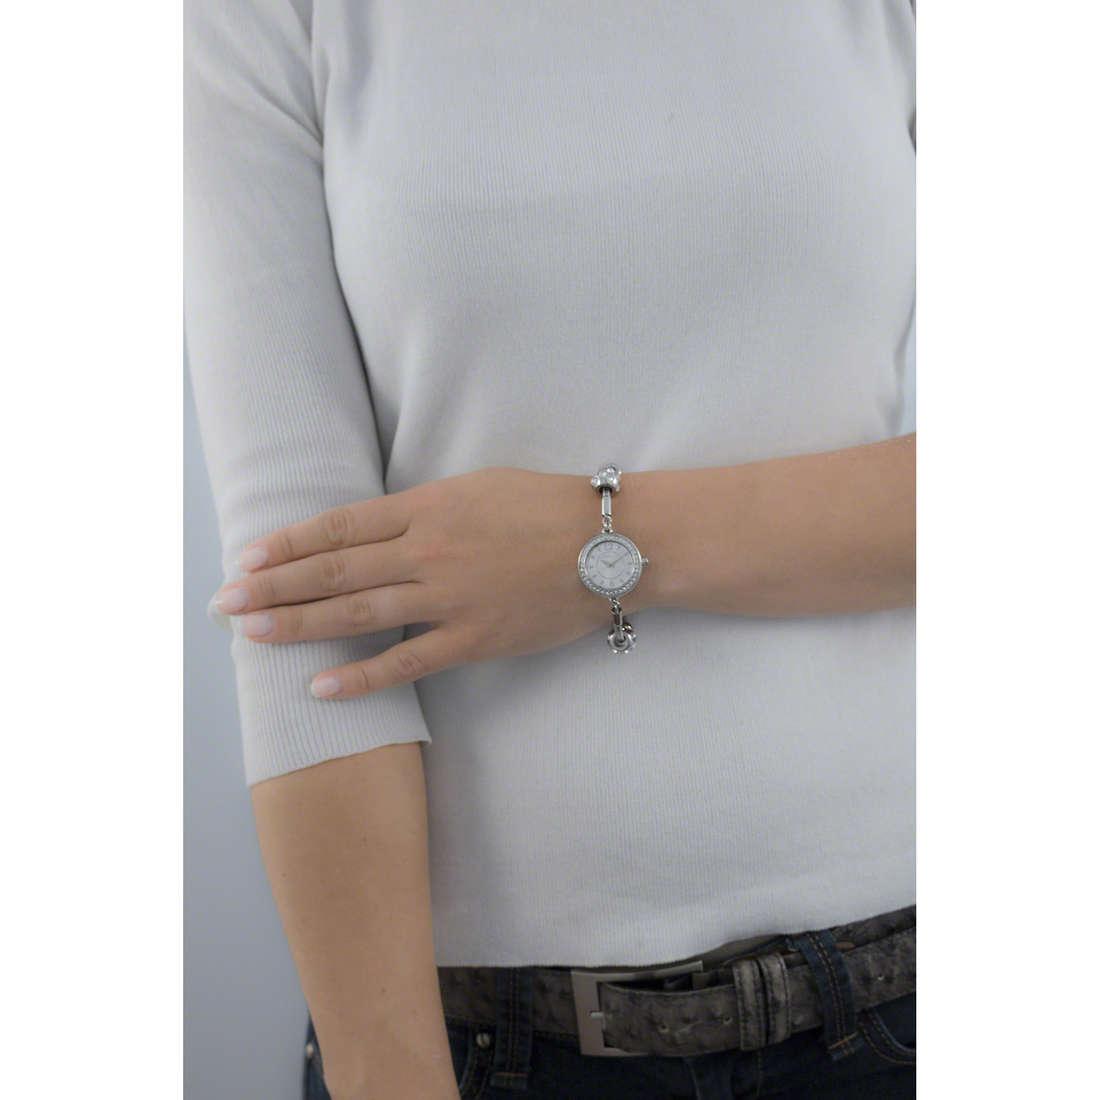 Morellato only time Drops Orologi woman R0153122507 indosso